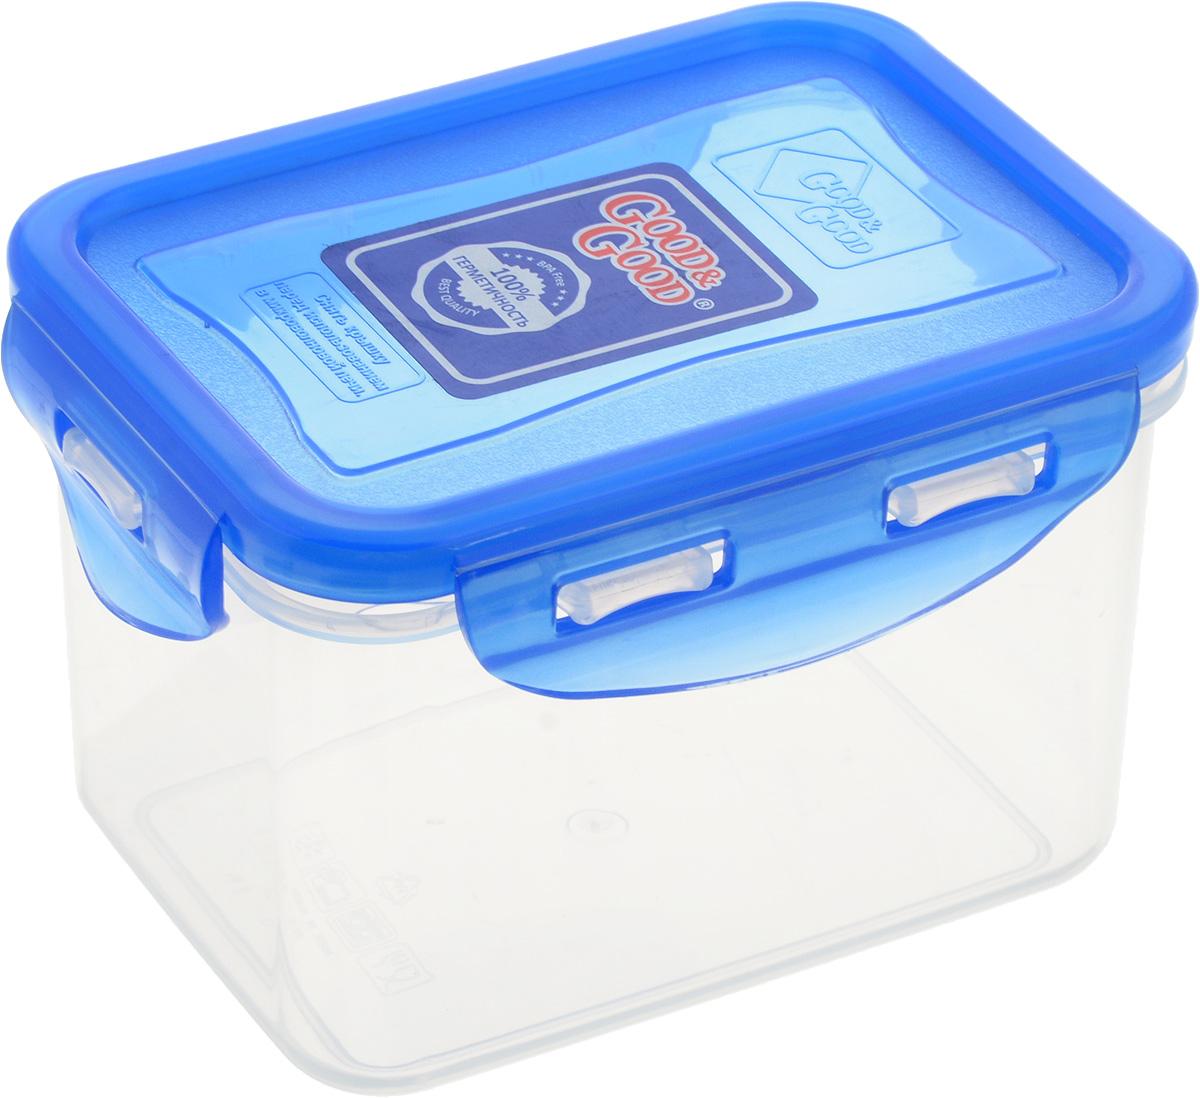 Контейнер пищевой Good&Good, цвет: прозрачный, синий, 630 мл good php33nq20t spd04n60c2 huf76107d3 ixag12n100 huf76107d3